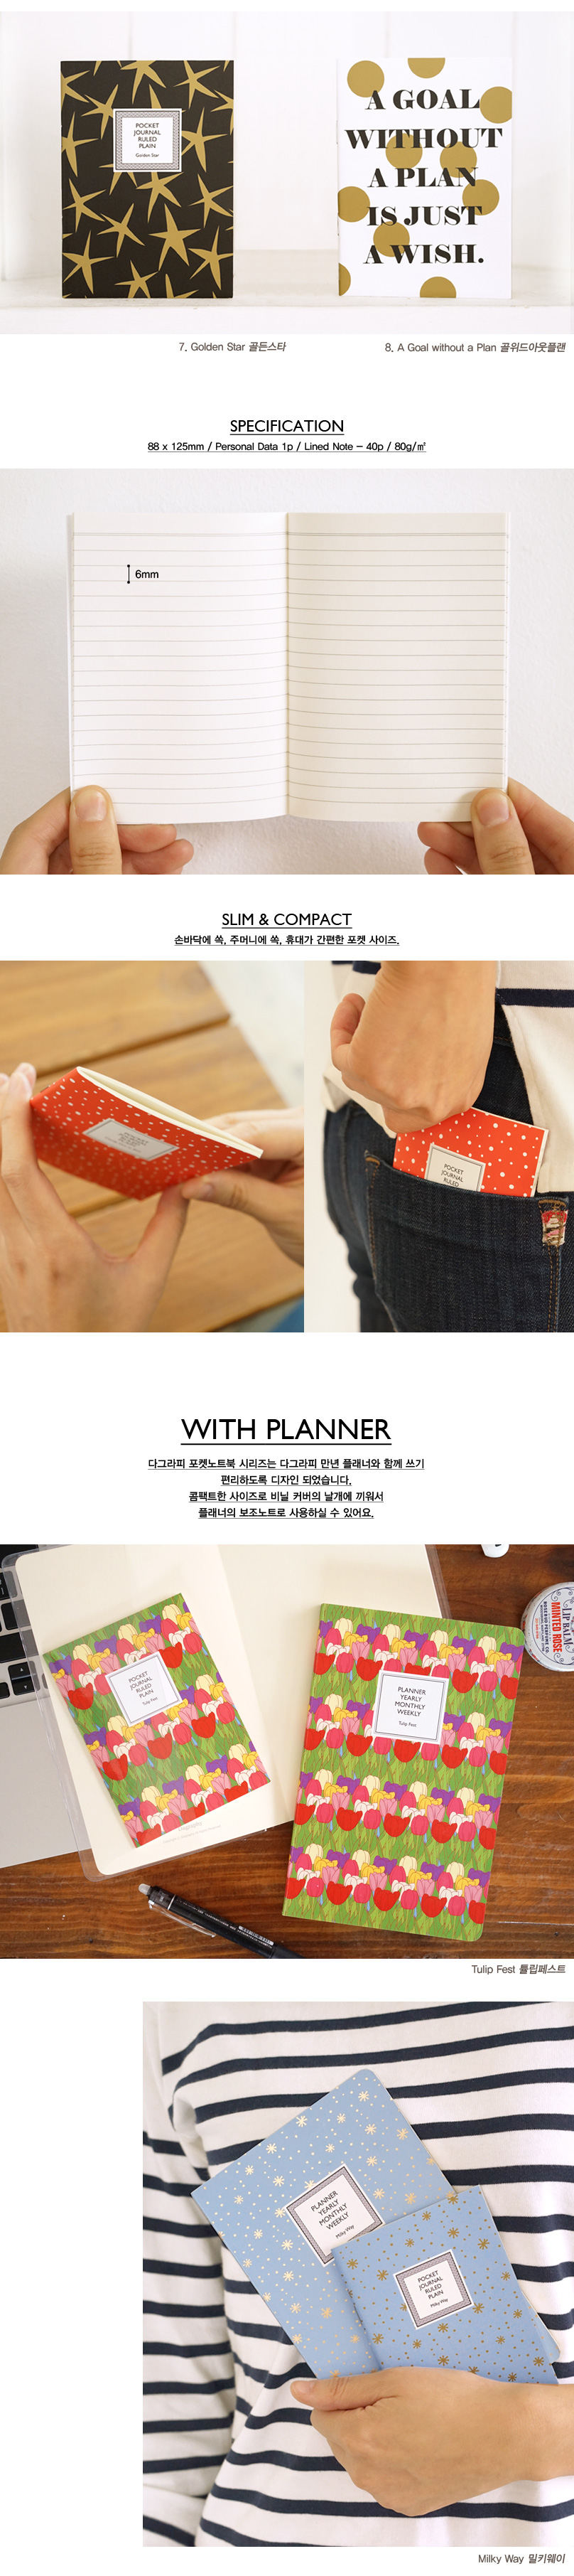 Pocket Note - 다그라피, 1,000원, 베이직노트, 미니노트